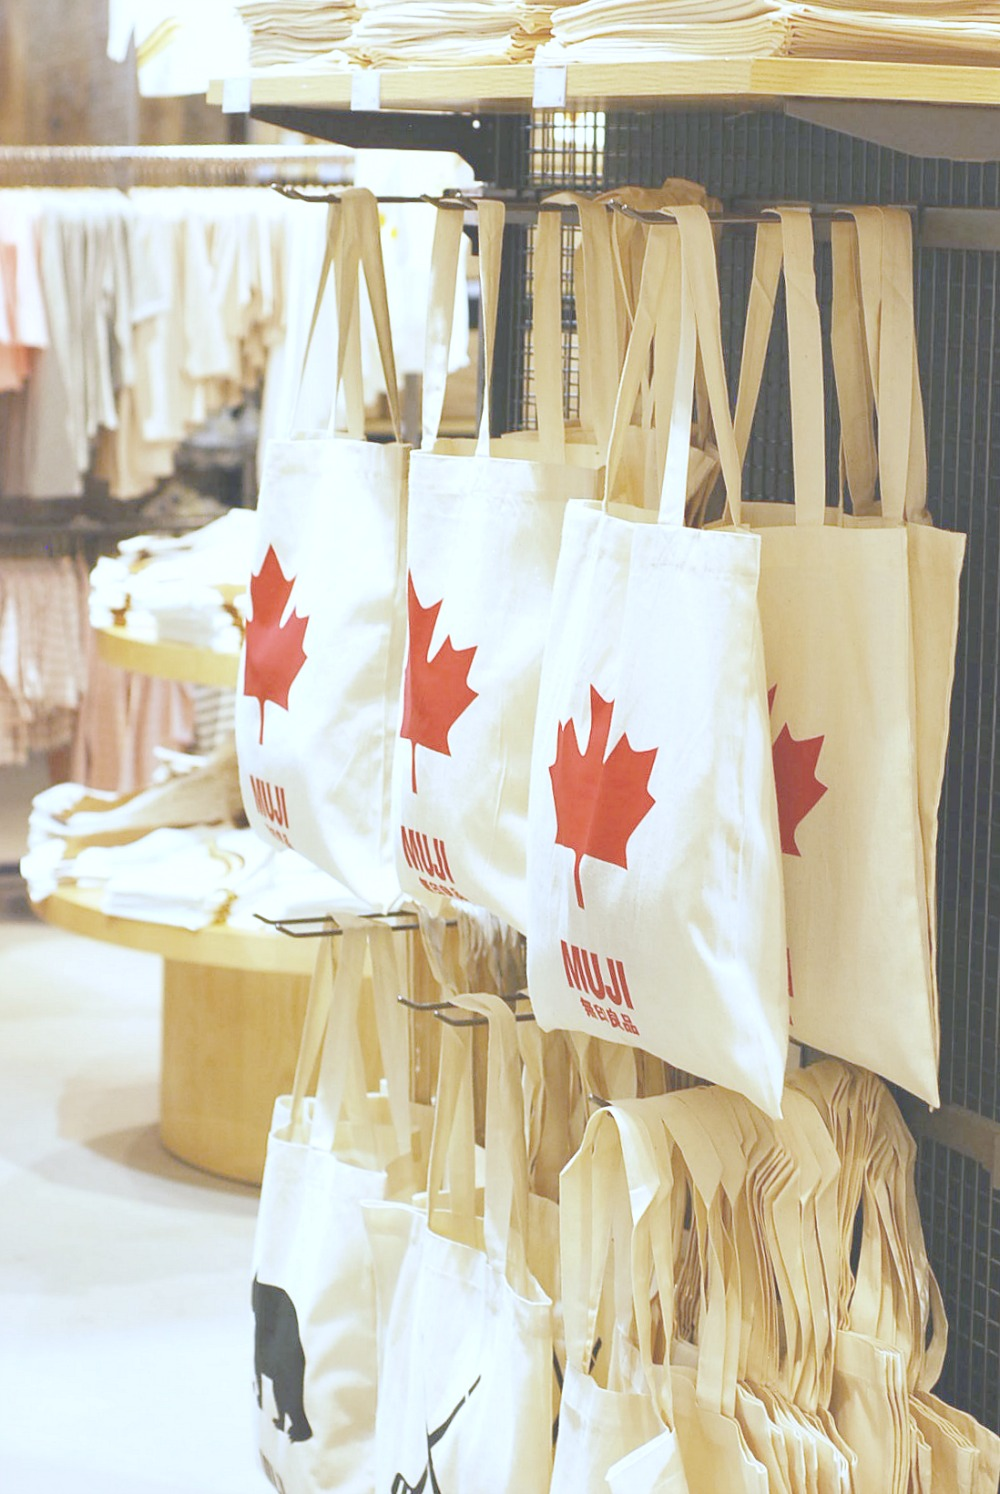 MUJI Canada Tote Bags